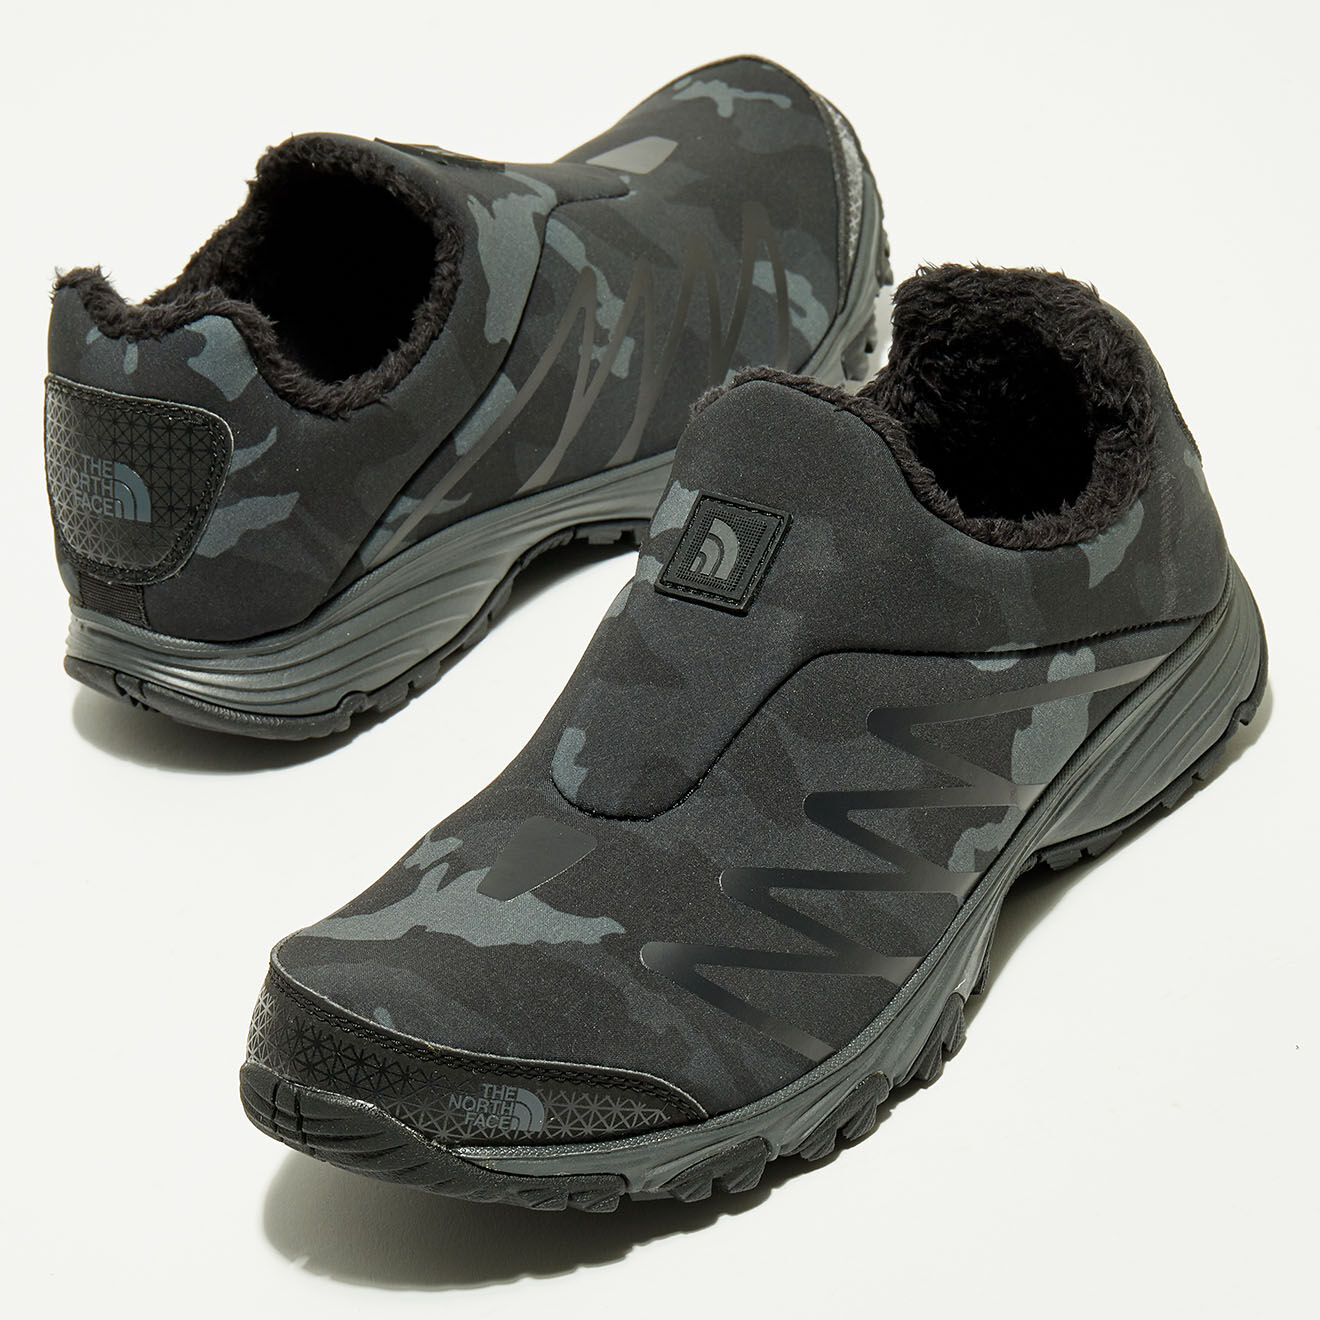 Sneakers fourrées trekking Venture Memo Camo - The North Face - Modalova